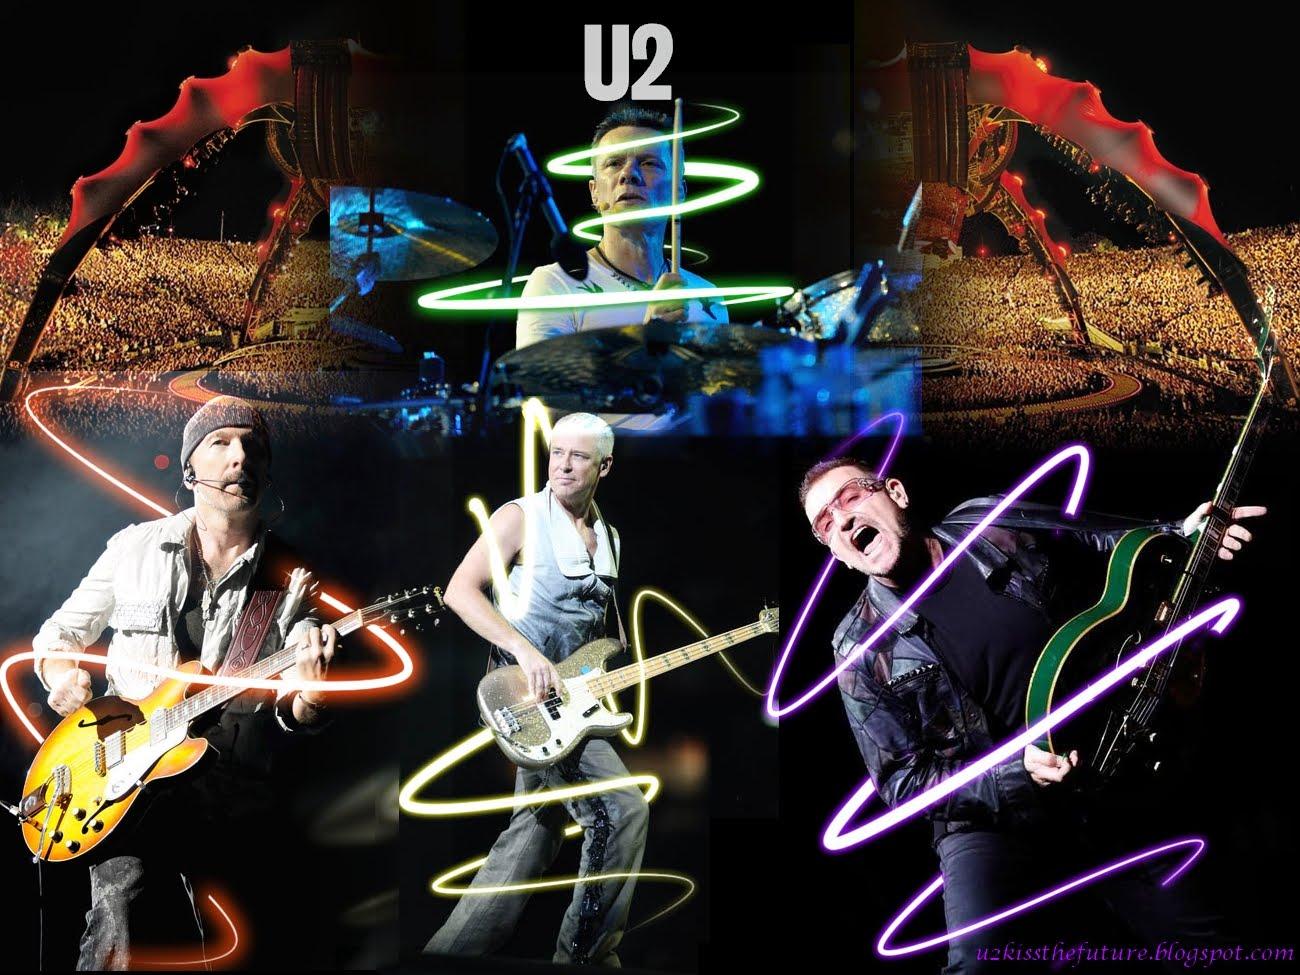 http://1.bp.blogspot.com/-ruRSaLef6Fk/T20-X_ZXv6I/AAAAAAAAADo/ITO0OenYuI0/s1600/U2+360%C2%BA+Tour+Ne%C3%B3n+Wallpaper.jpg